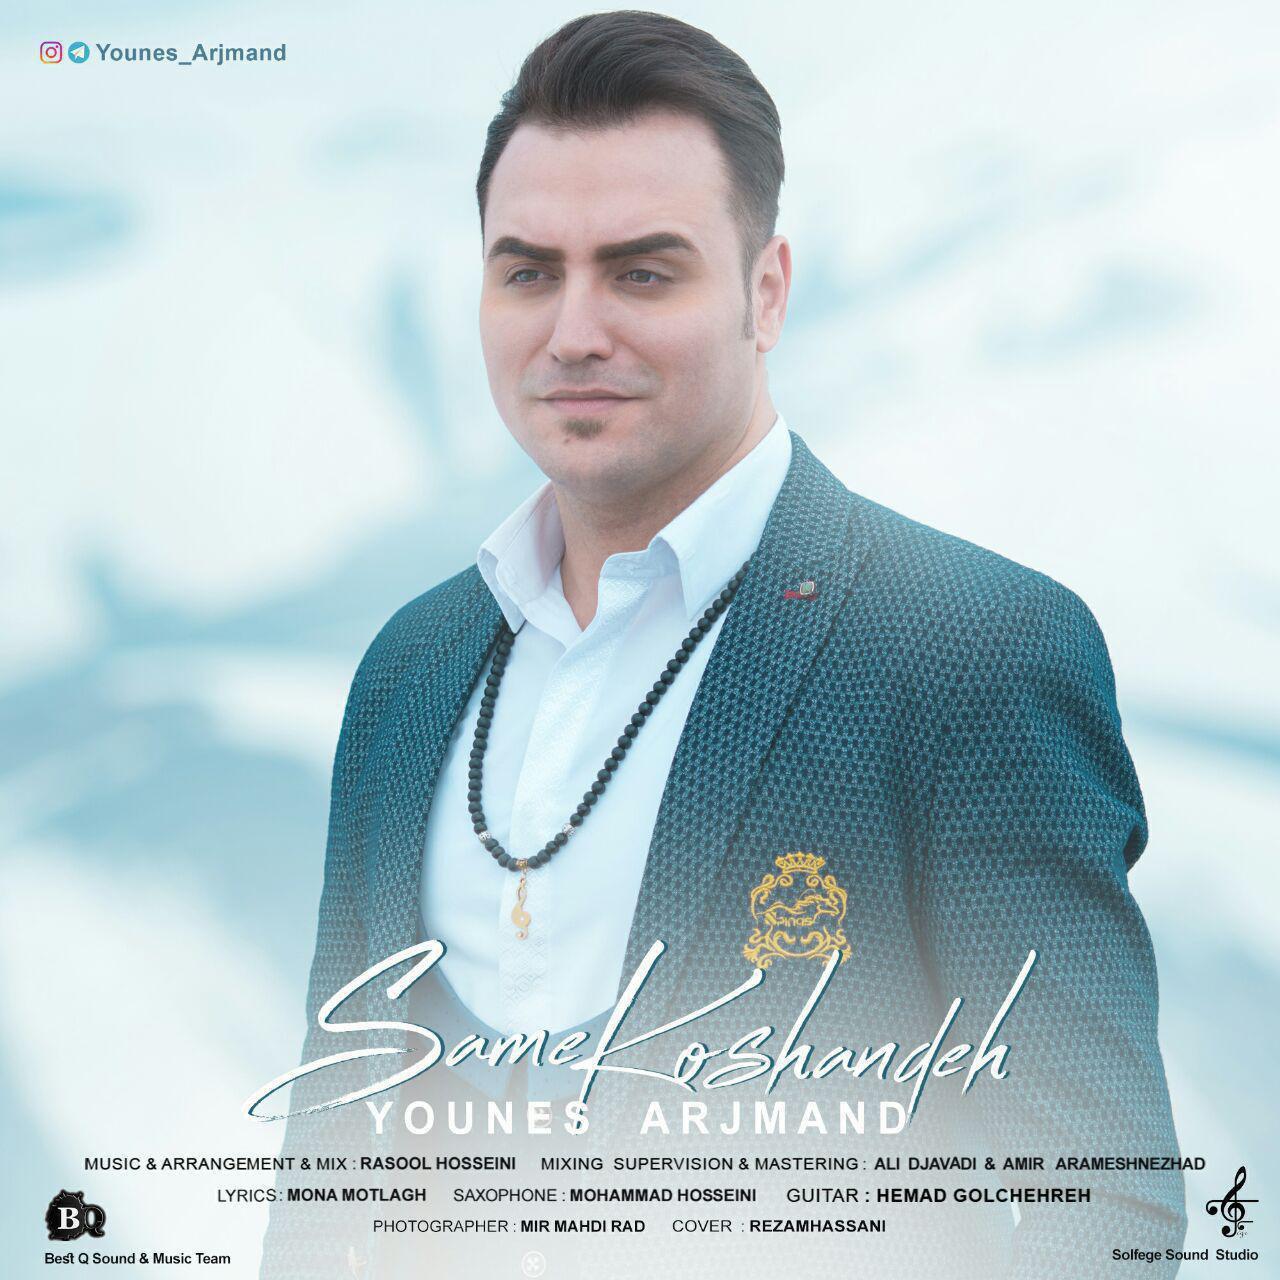 Younes Arjmand - Same Koshandeh Music | آهنگ یونس ارجمند - سم کشنده